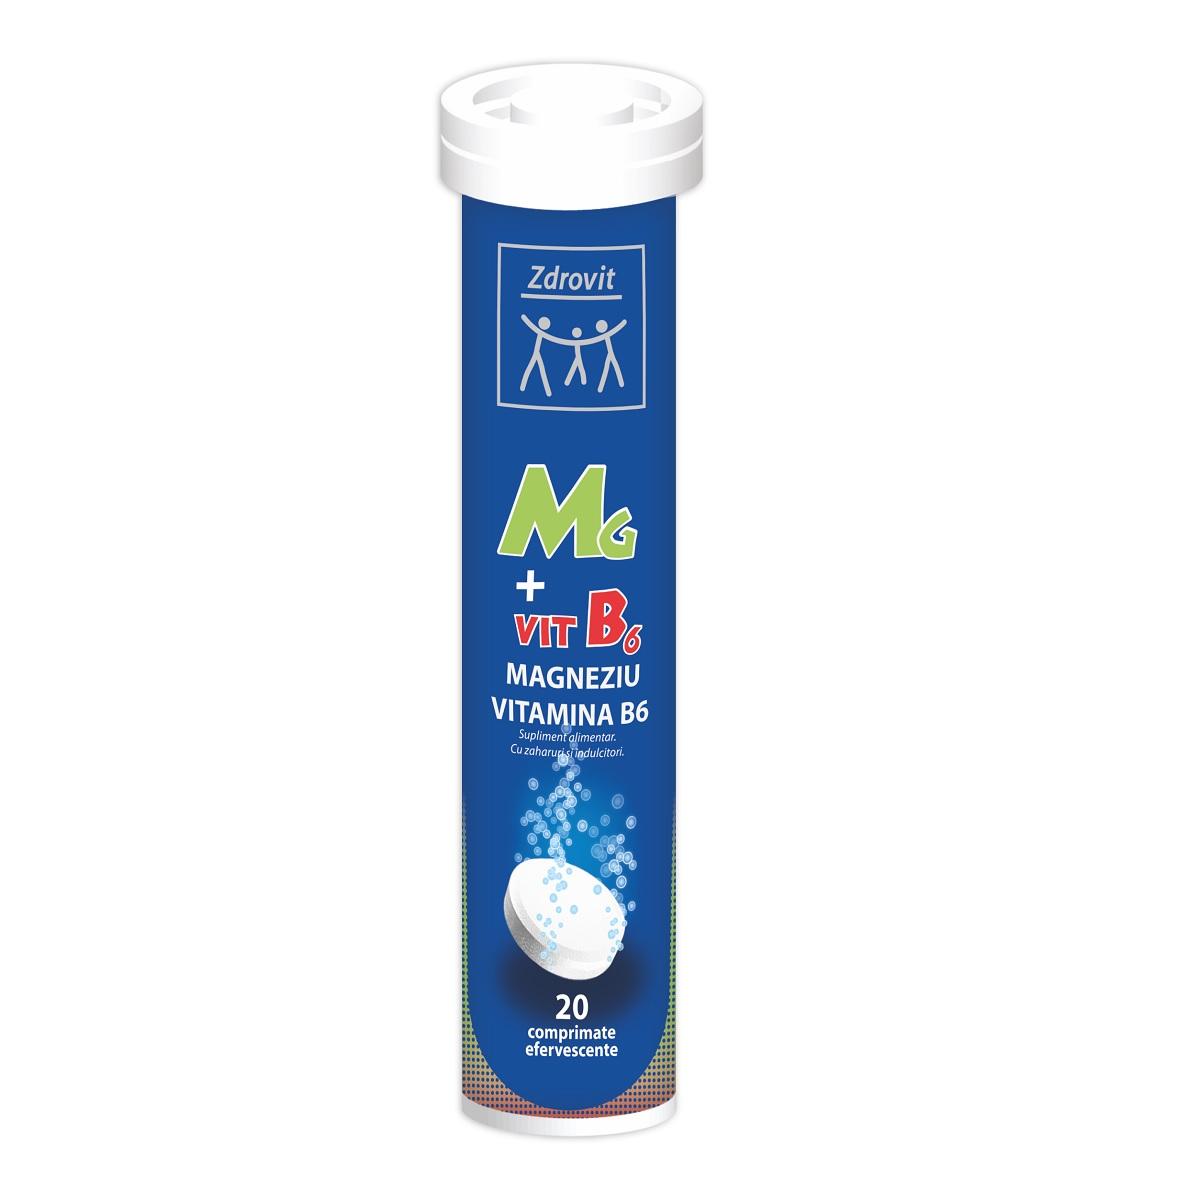 Magneziu + Vitamina B6, 20 comprimate efervescente, Zdrovit